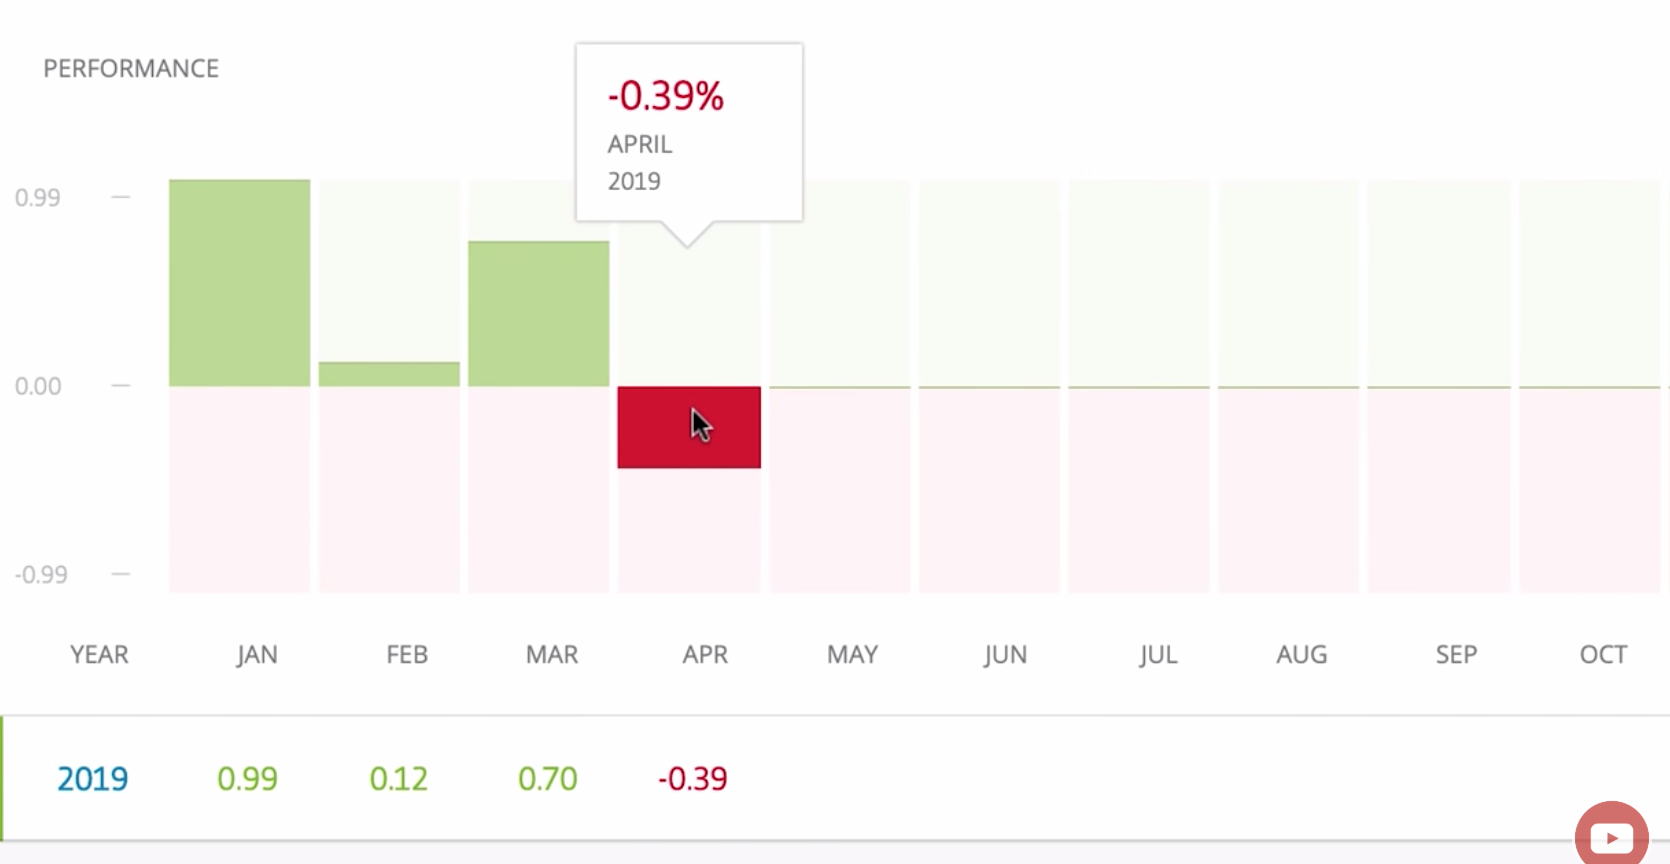 Olivier Danvel stats showing slight loss in April 2019